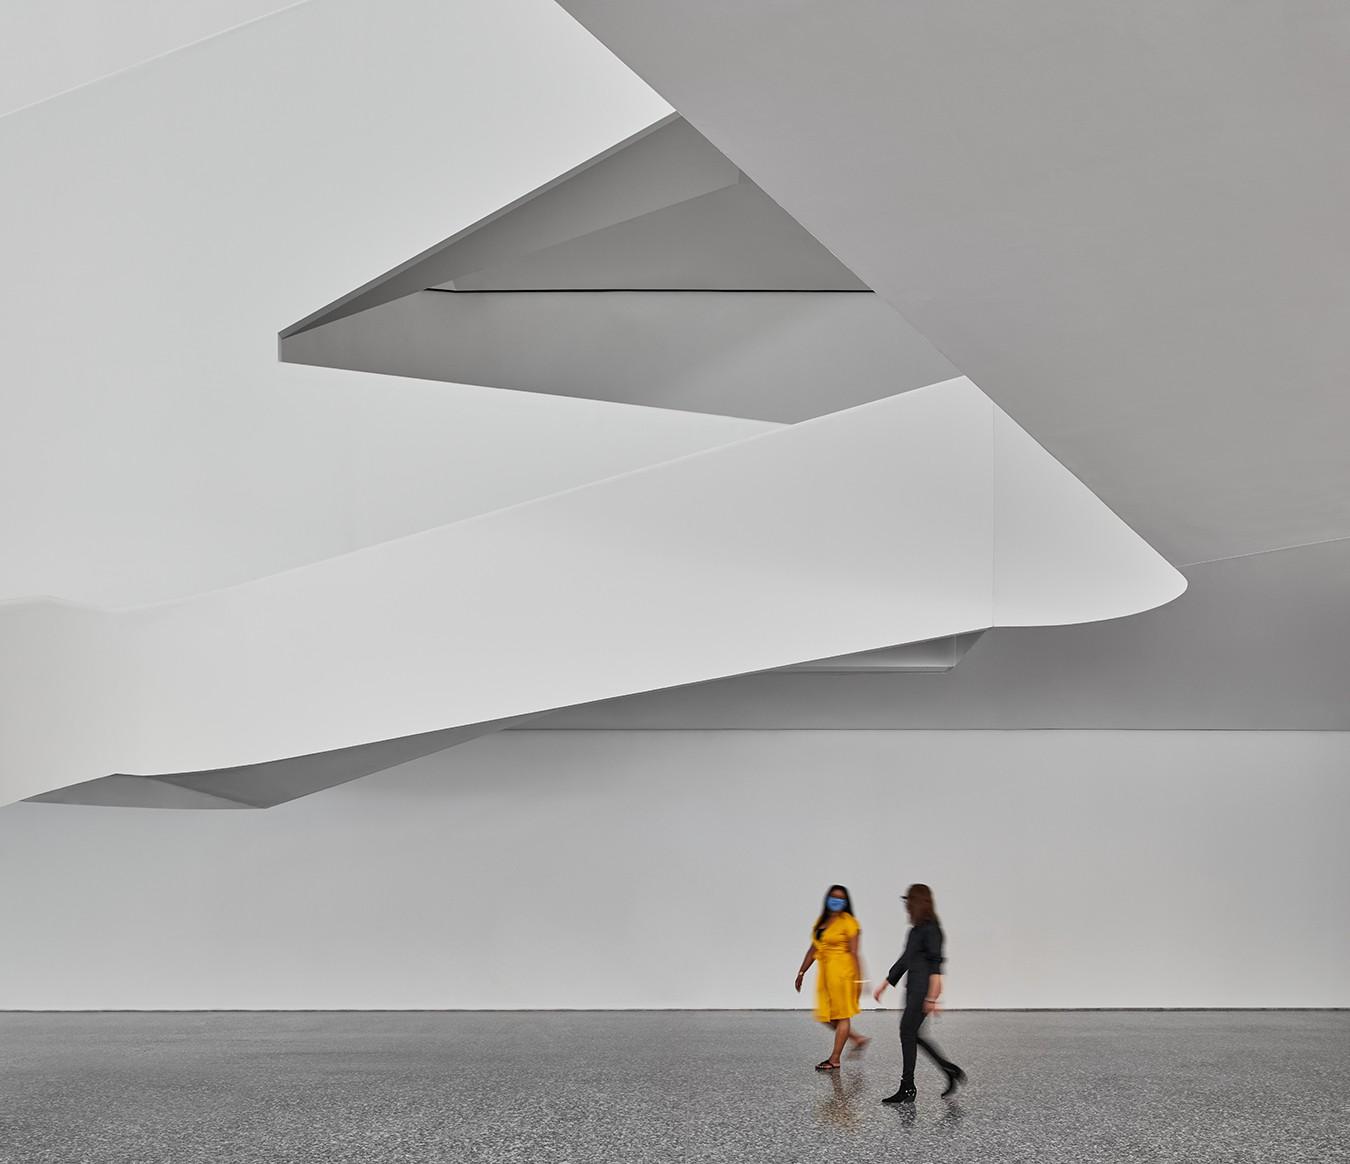 https://stevenholl.sfo2.digitaloceanspaces.com/uploads/projects/project-images/interiorforum_peterMollick.jpg